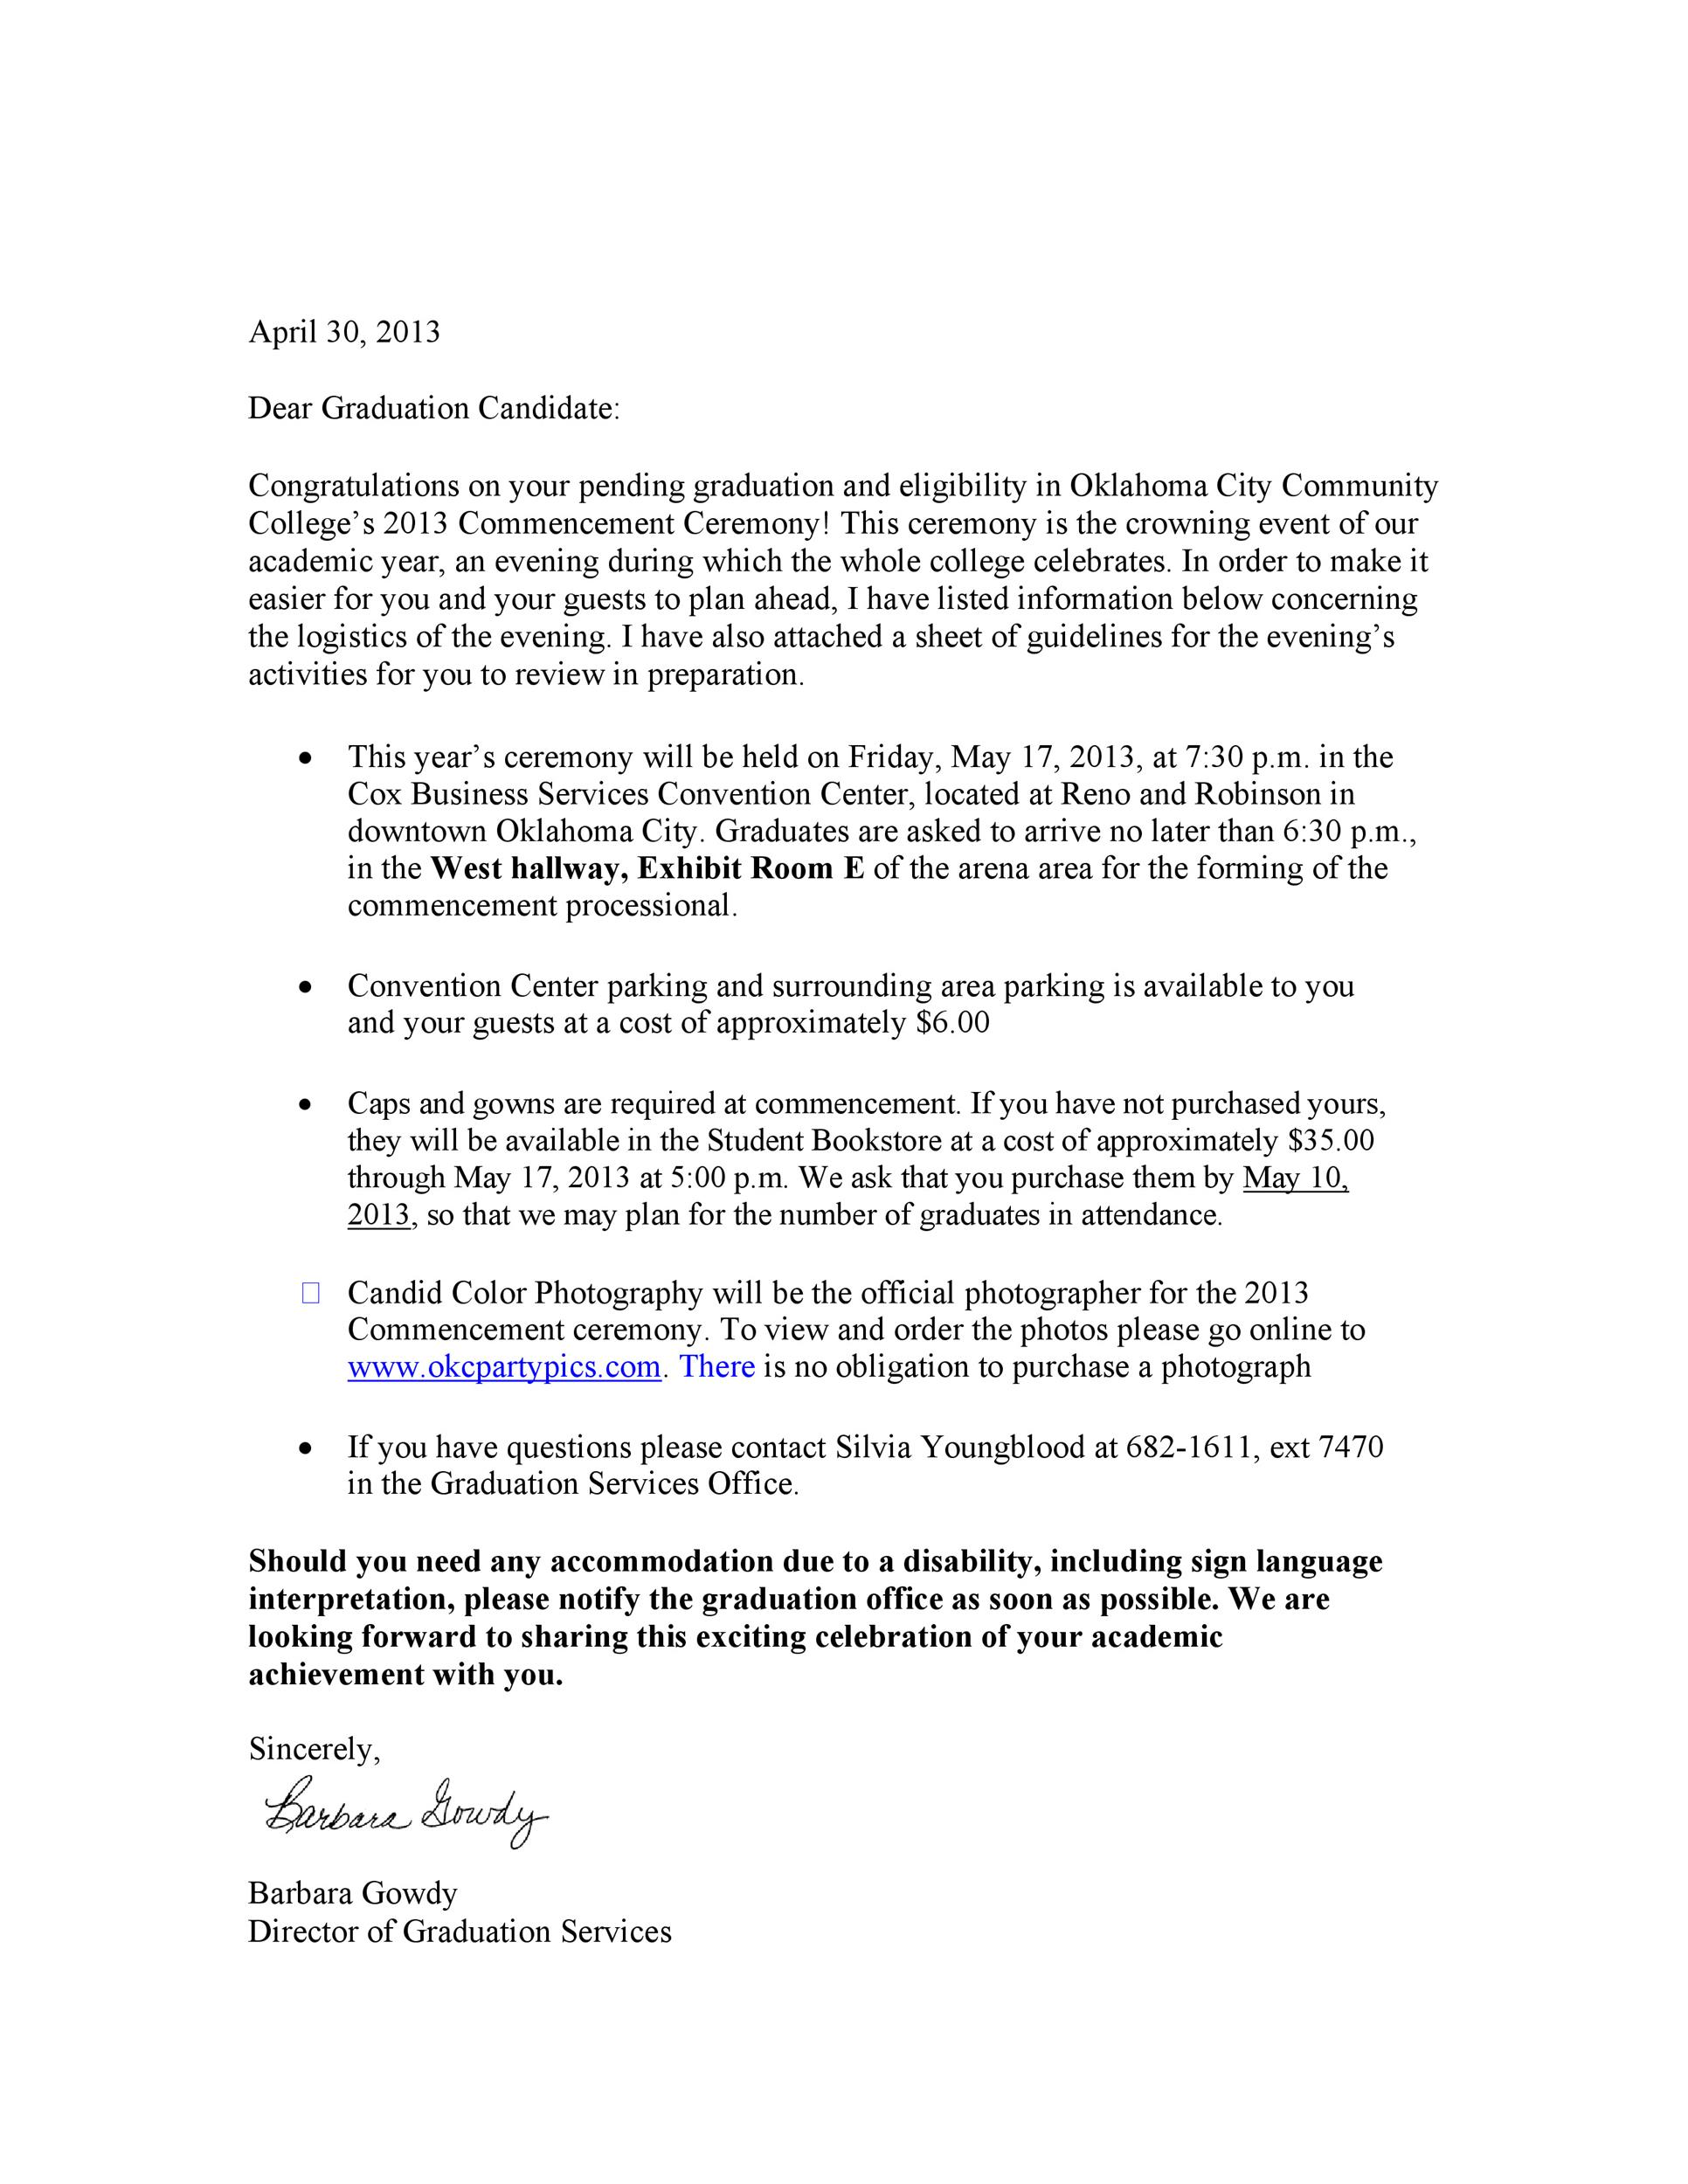 Free congratulations letter 18